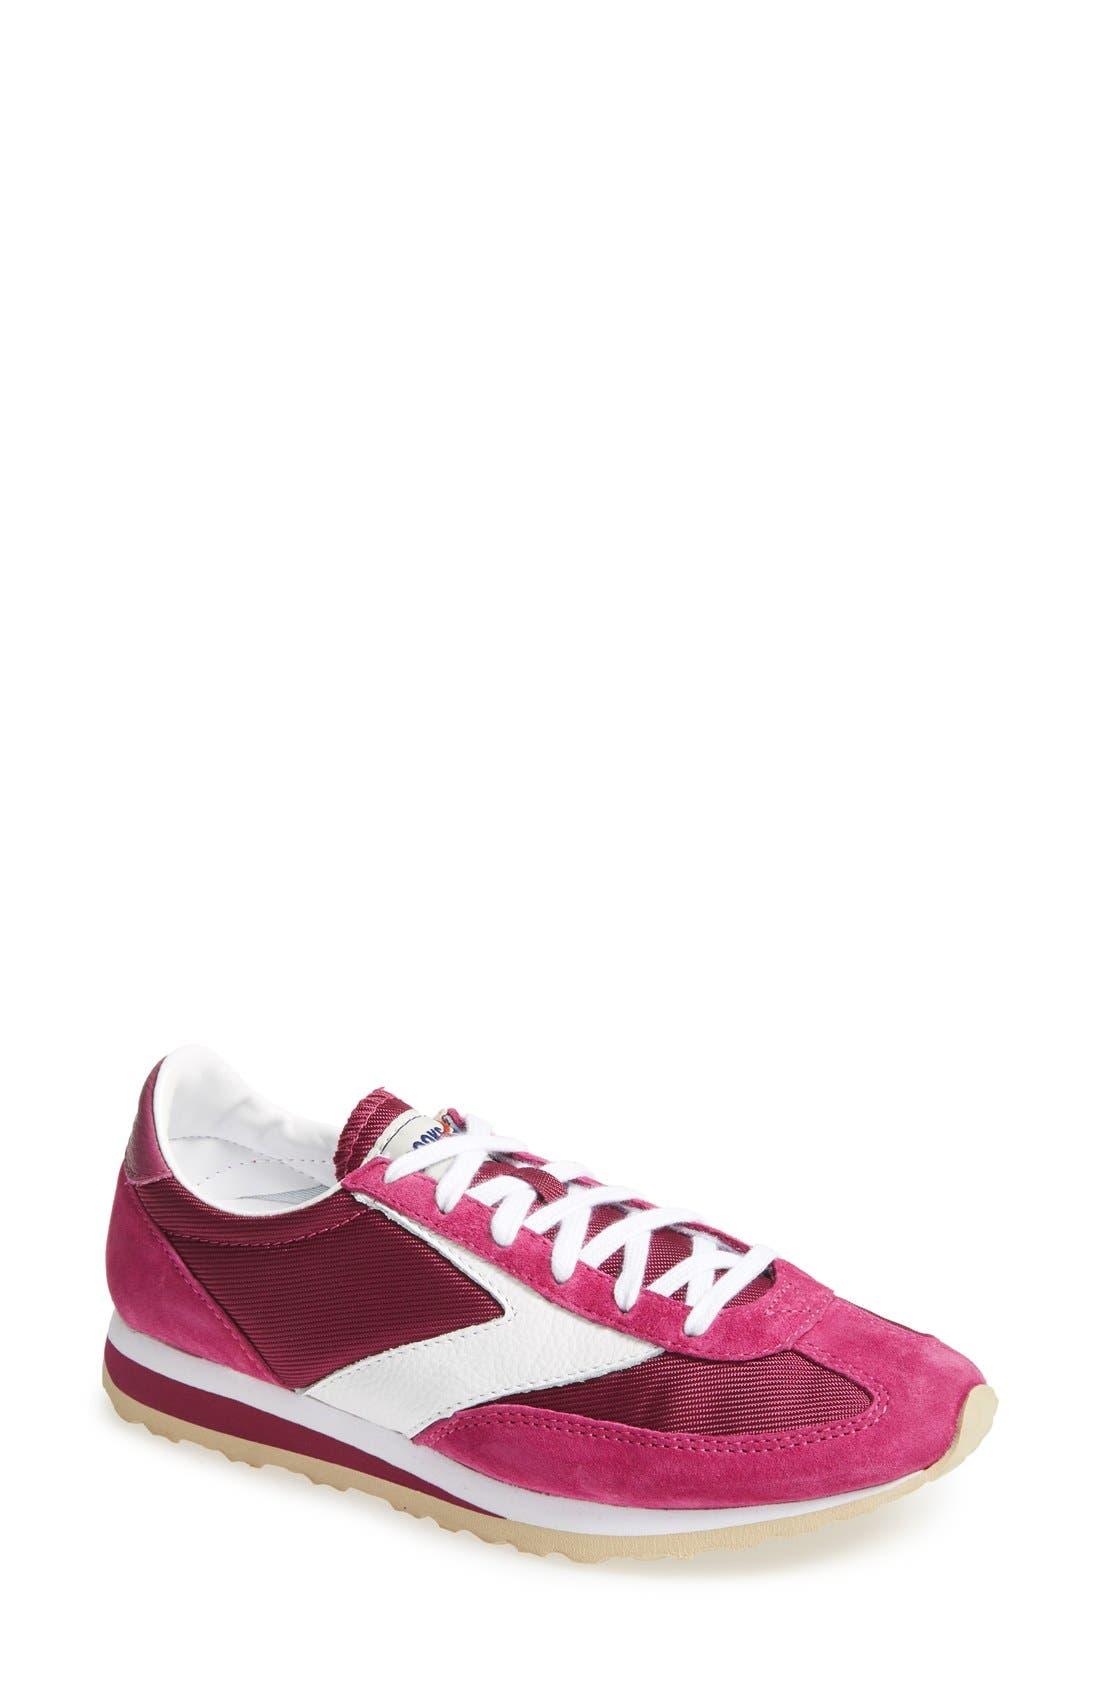 Main Image - Brooks 'Vanguard' Sneaker (Women)